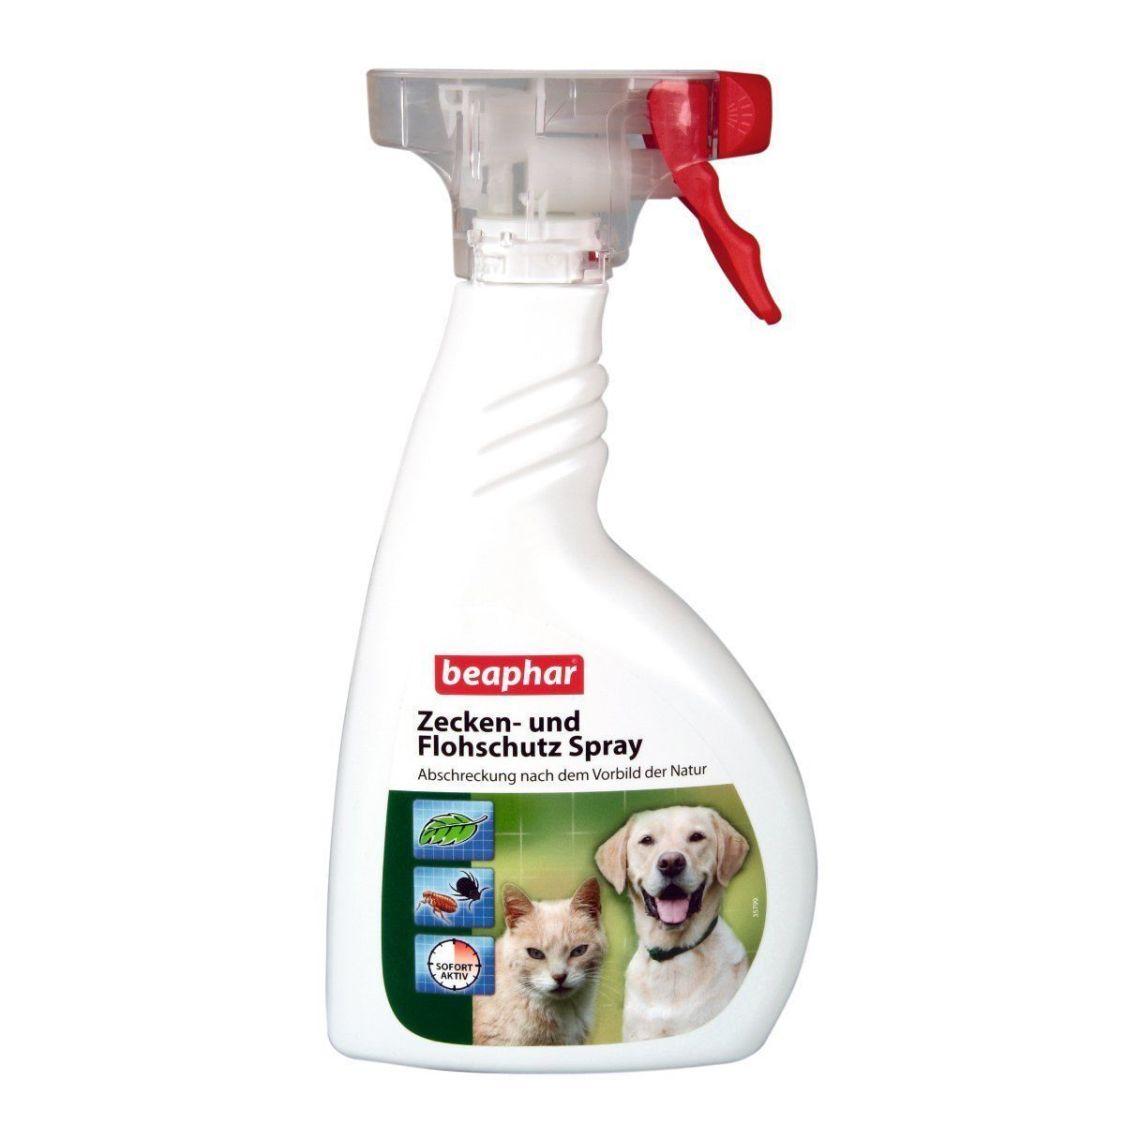 Beaphar Zecken-und Flohschutz Spray 400ml Flöhe Grasmilben Hunde Katze Flohspray